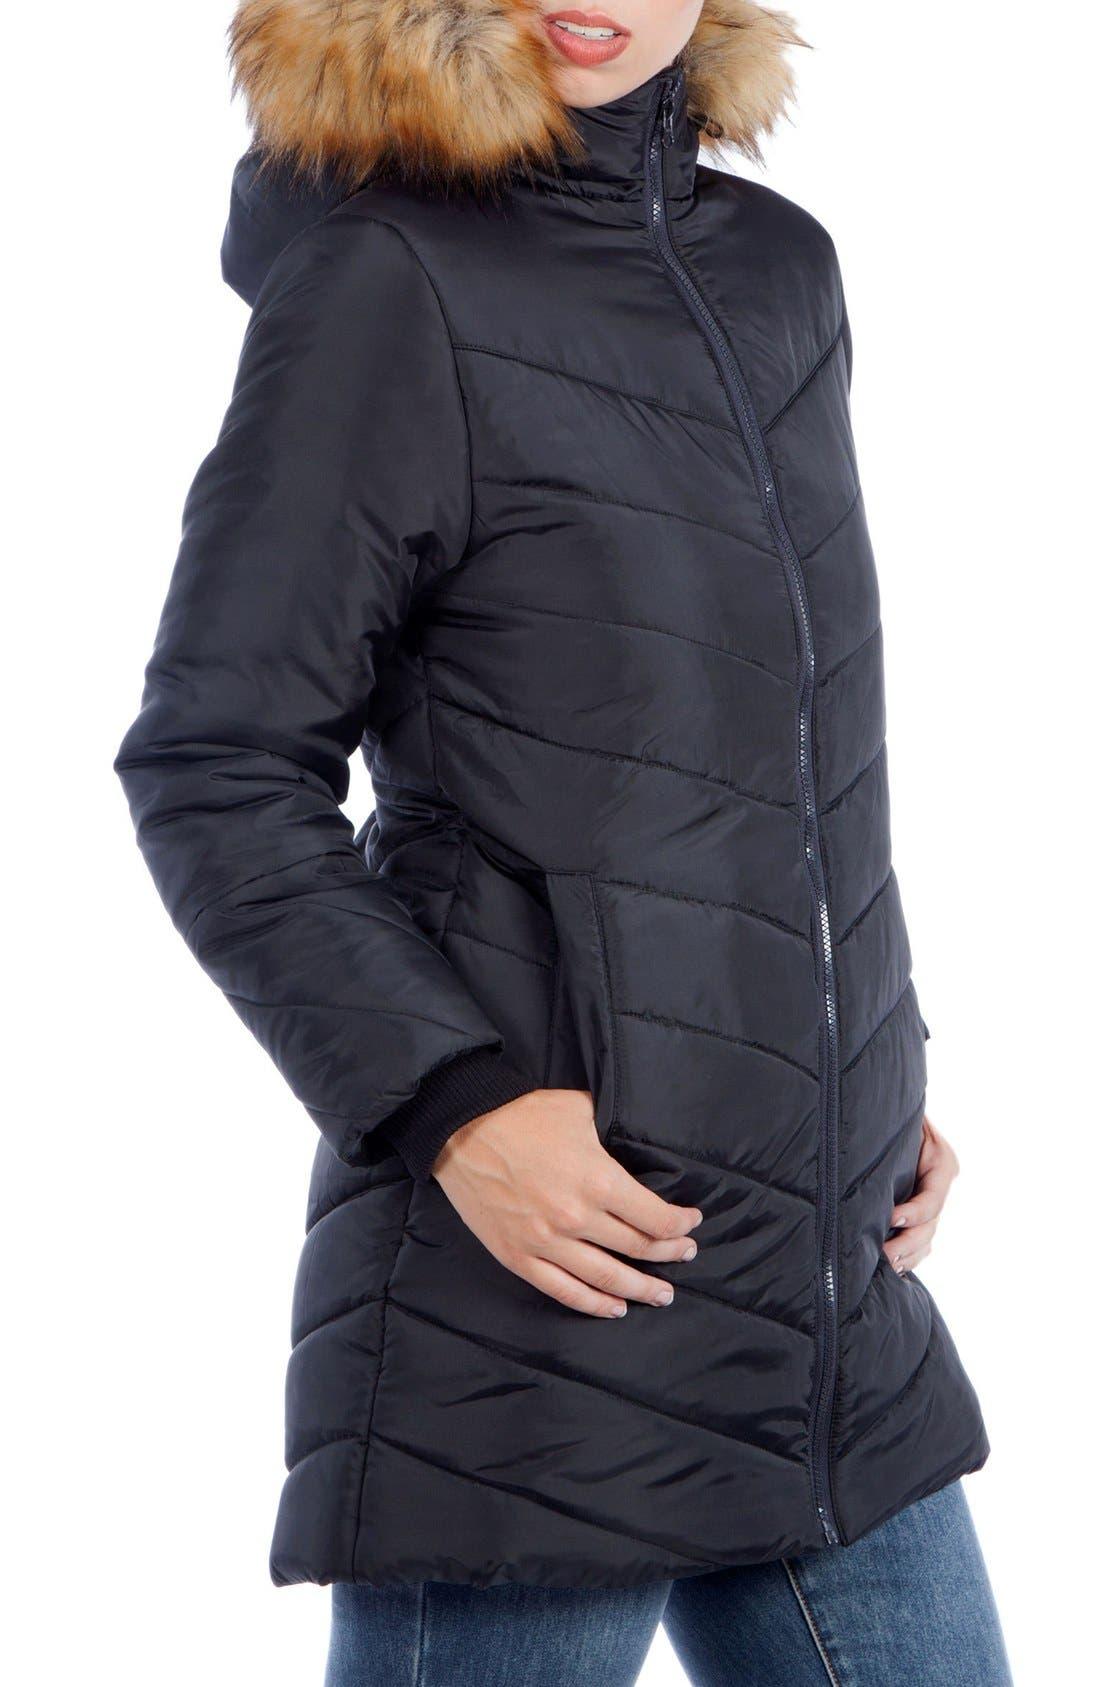 MODERN ETERNITY, Faux Fur Trim Convertible Puffer 3-in-1 Maternity Jacket, Alternate thumbnail 8, color, BLACK